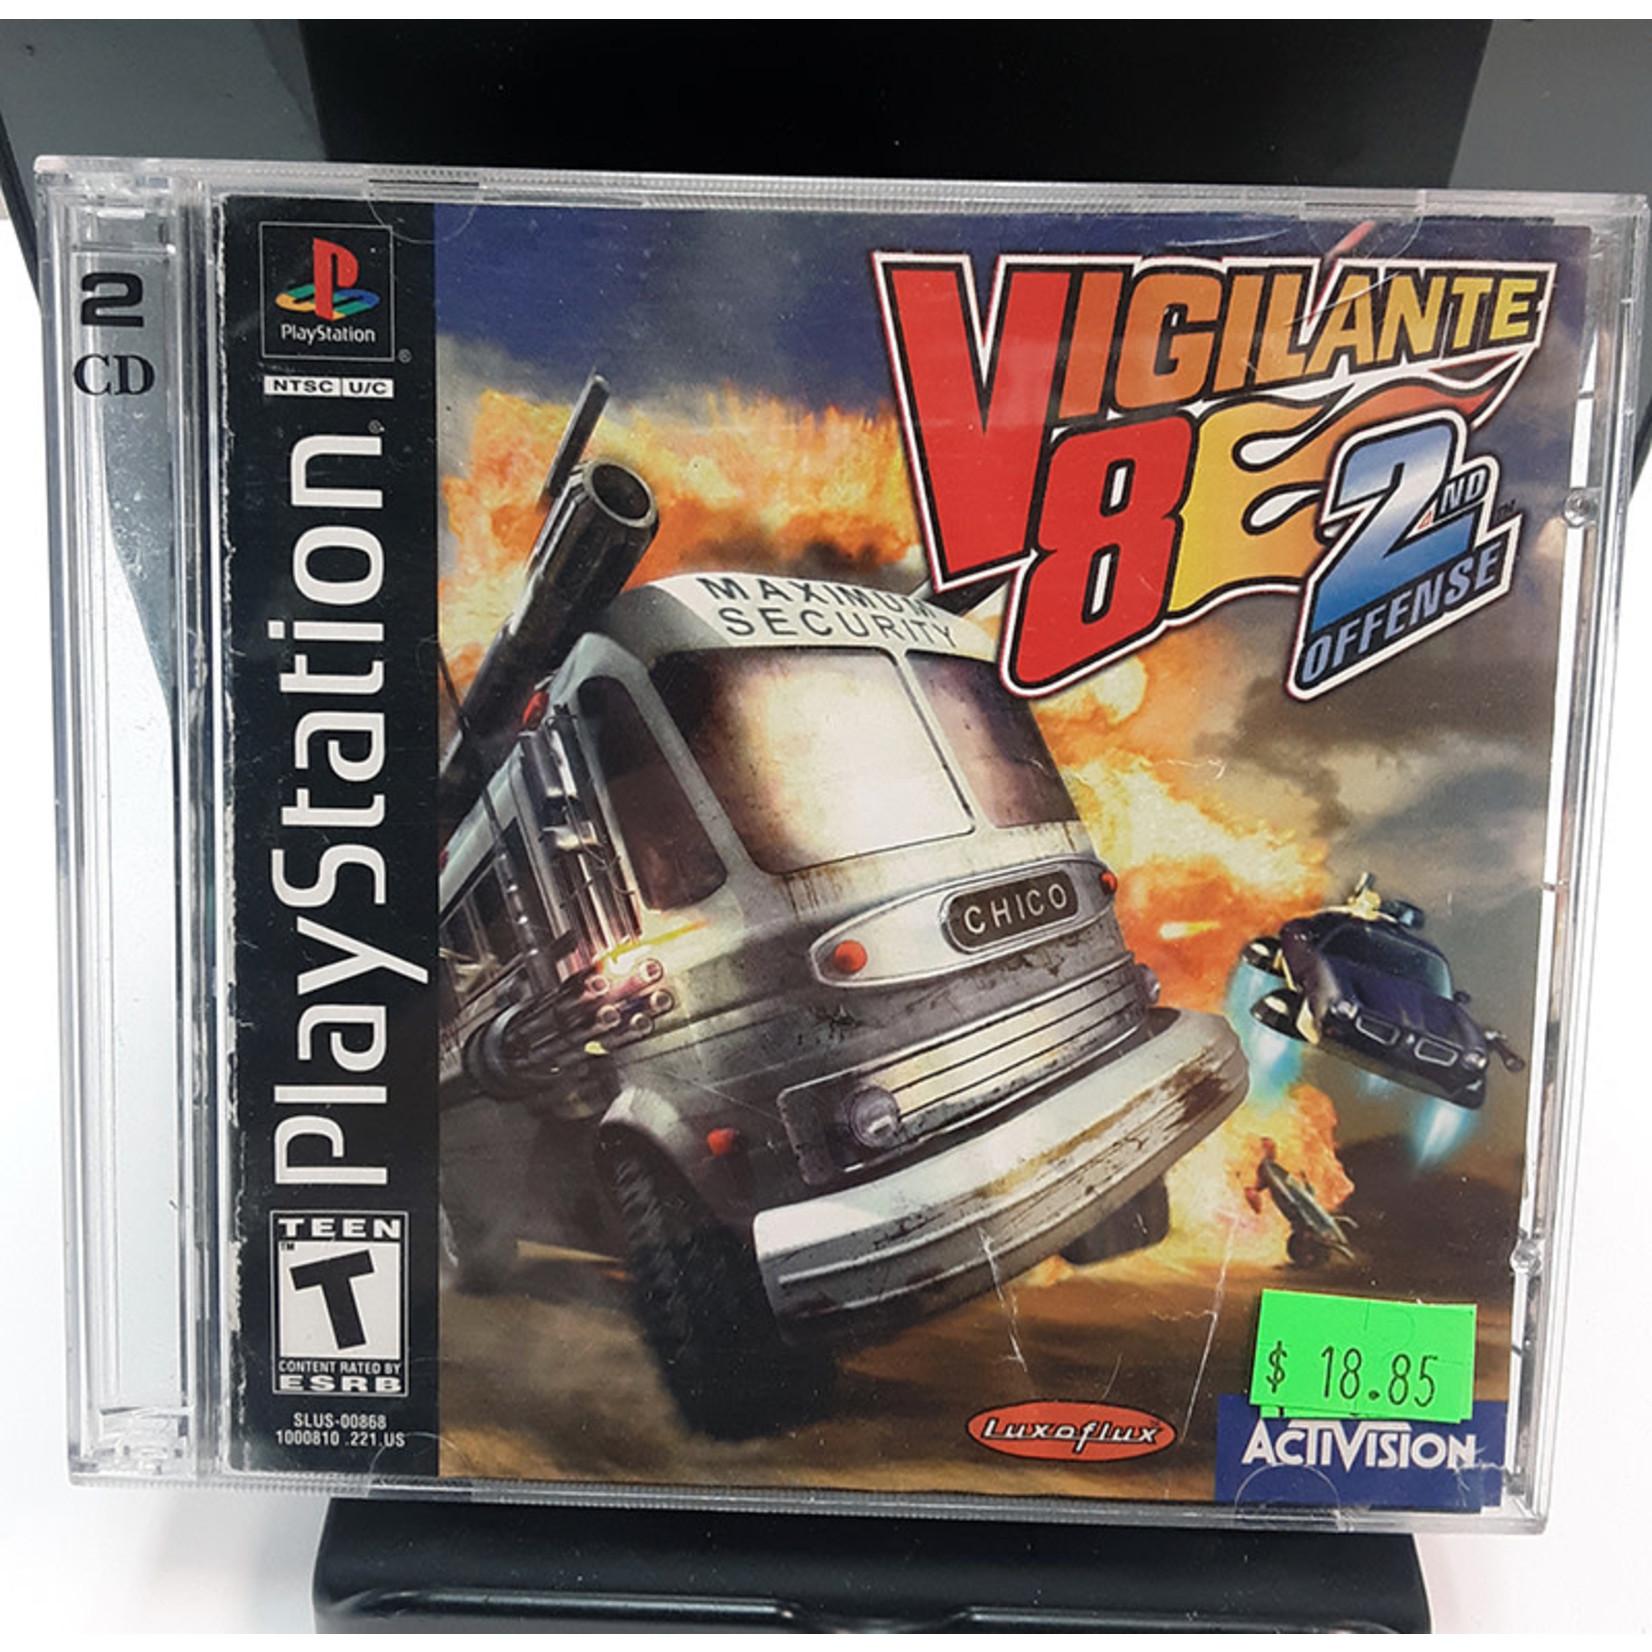 ps1u-Vigilante 8 2nd offense